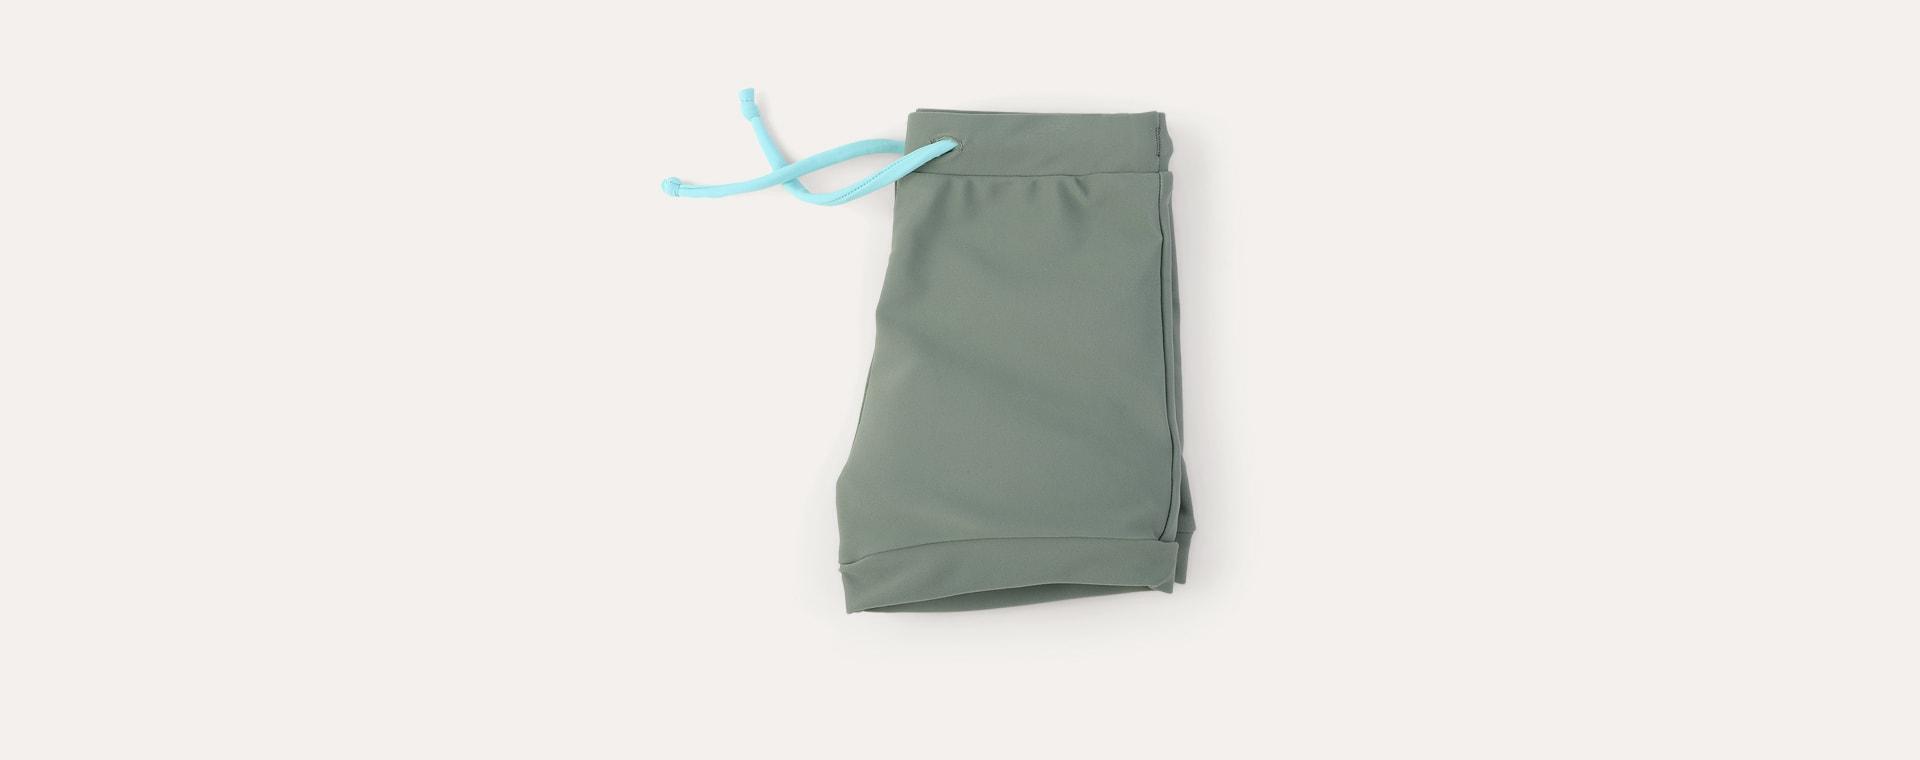 Olive KIDLY Label Recycled Swim Trunks